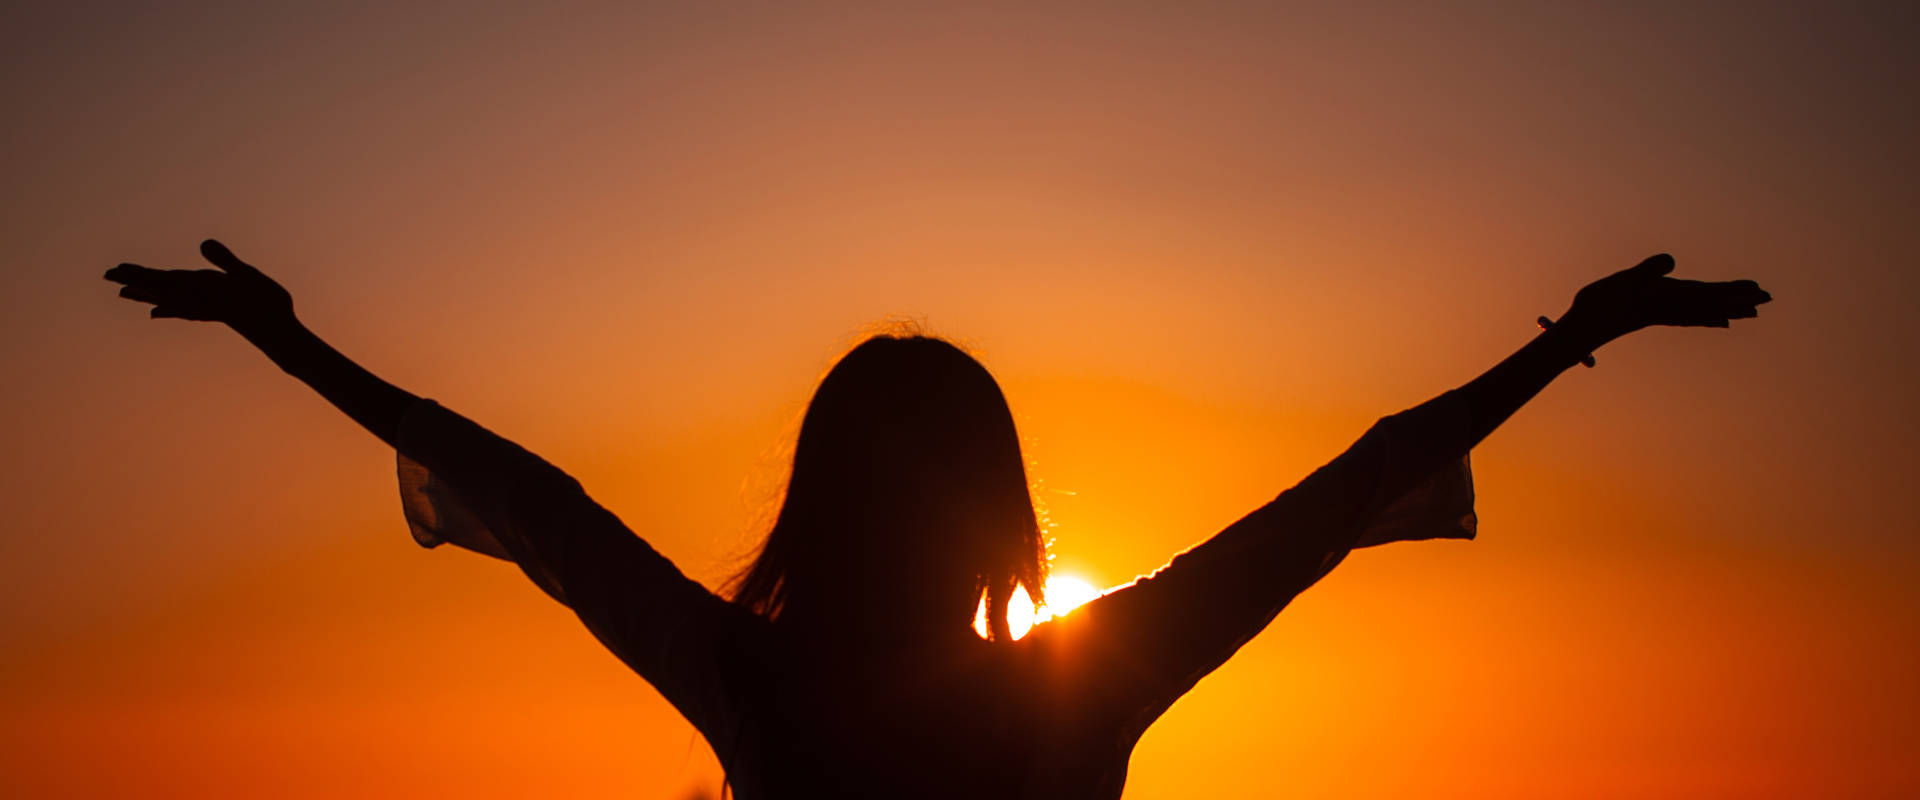 darshanatura-solstizio-estate-significato-spirituale-header